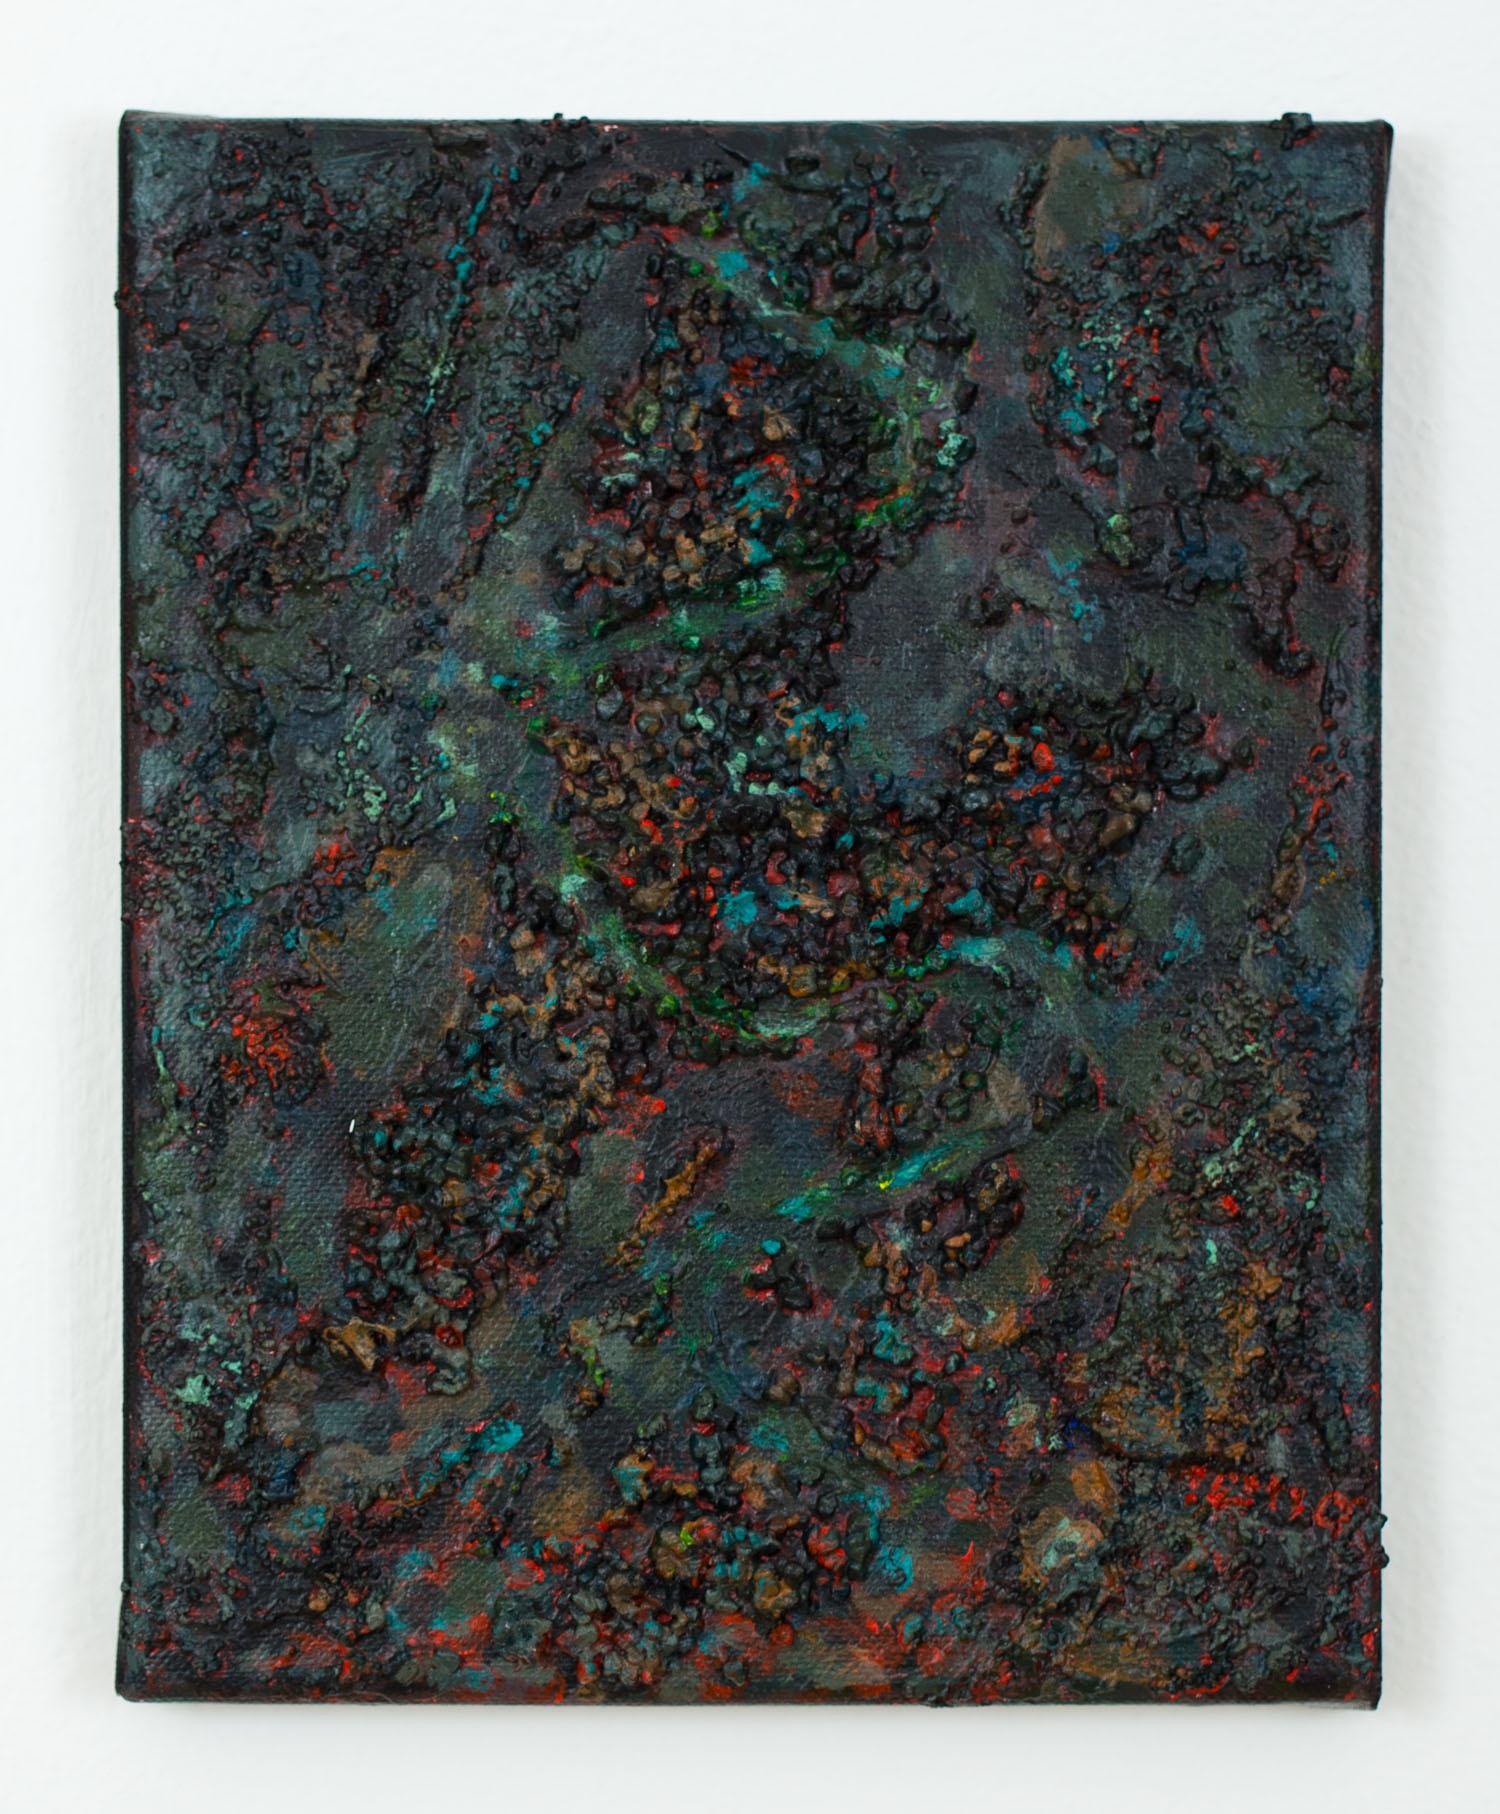 Melissa 2,  November 2012, Acrylic on cotton duck, 10 x 8 in